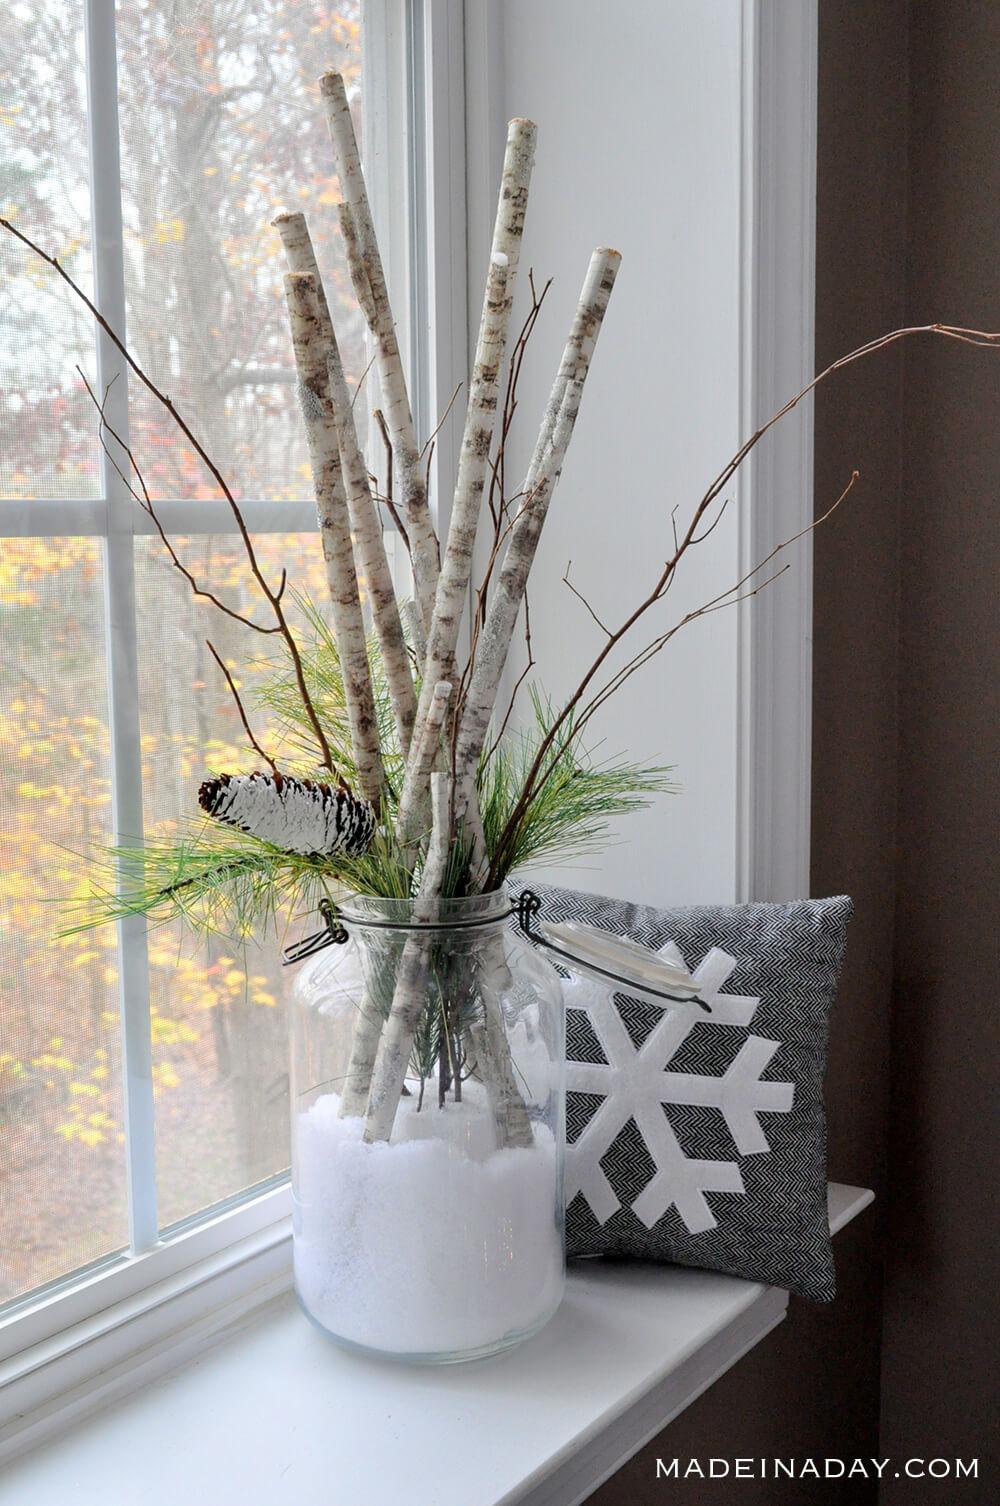 Unexpected Birch Sticks in Snow Arrangement